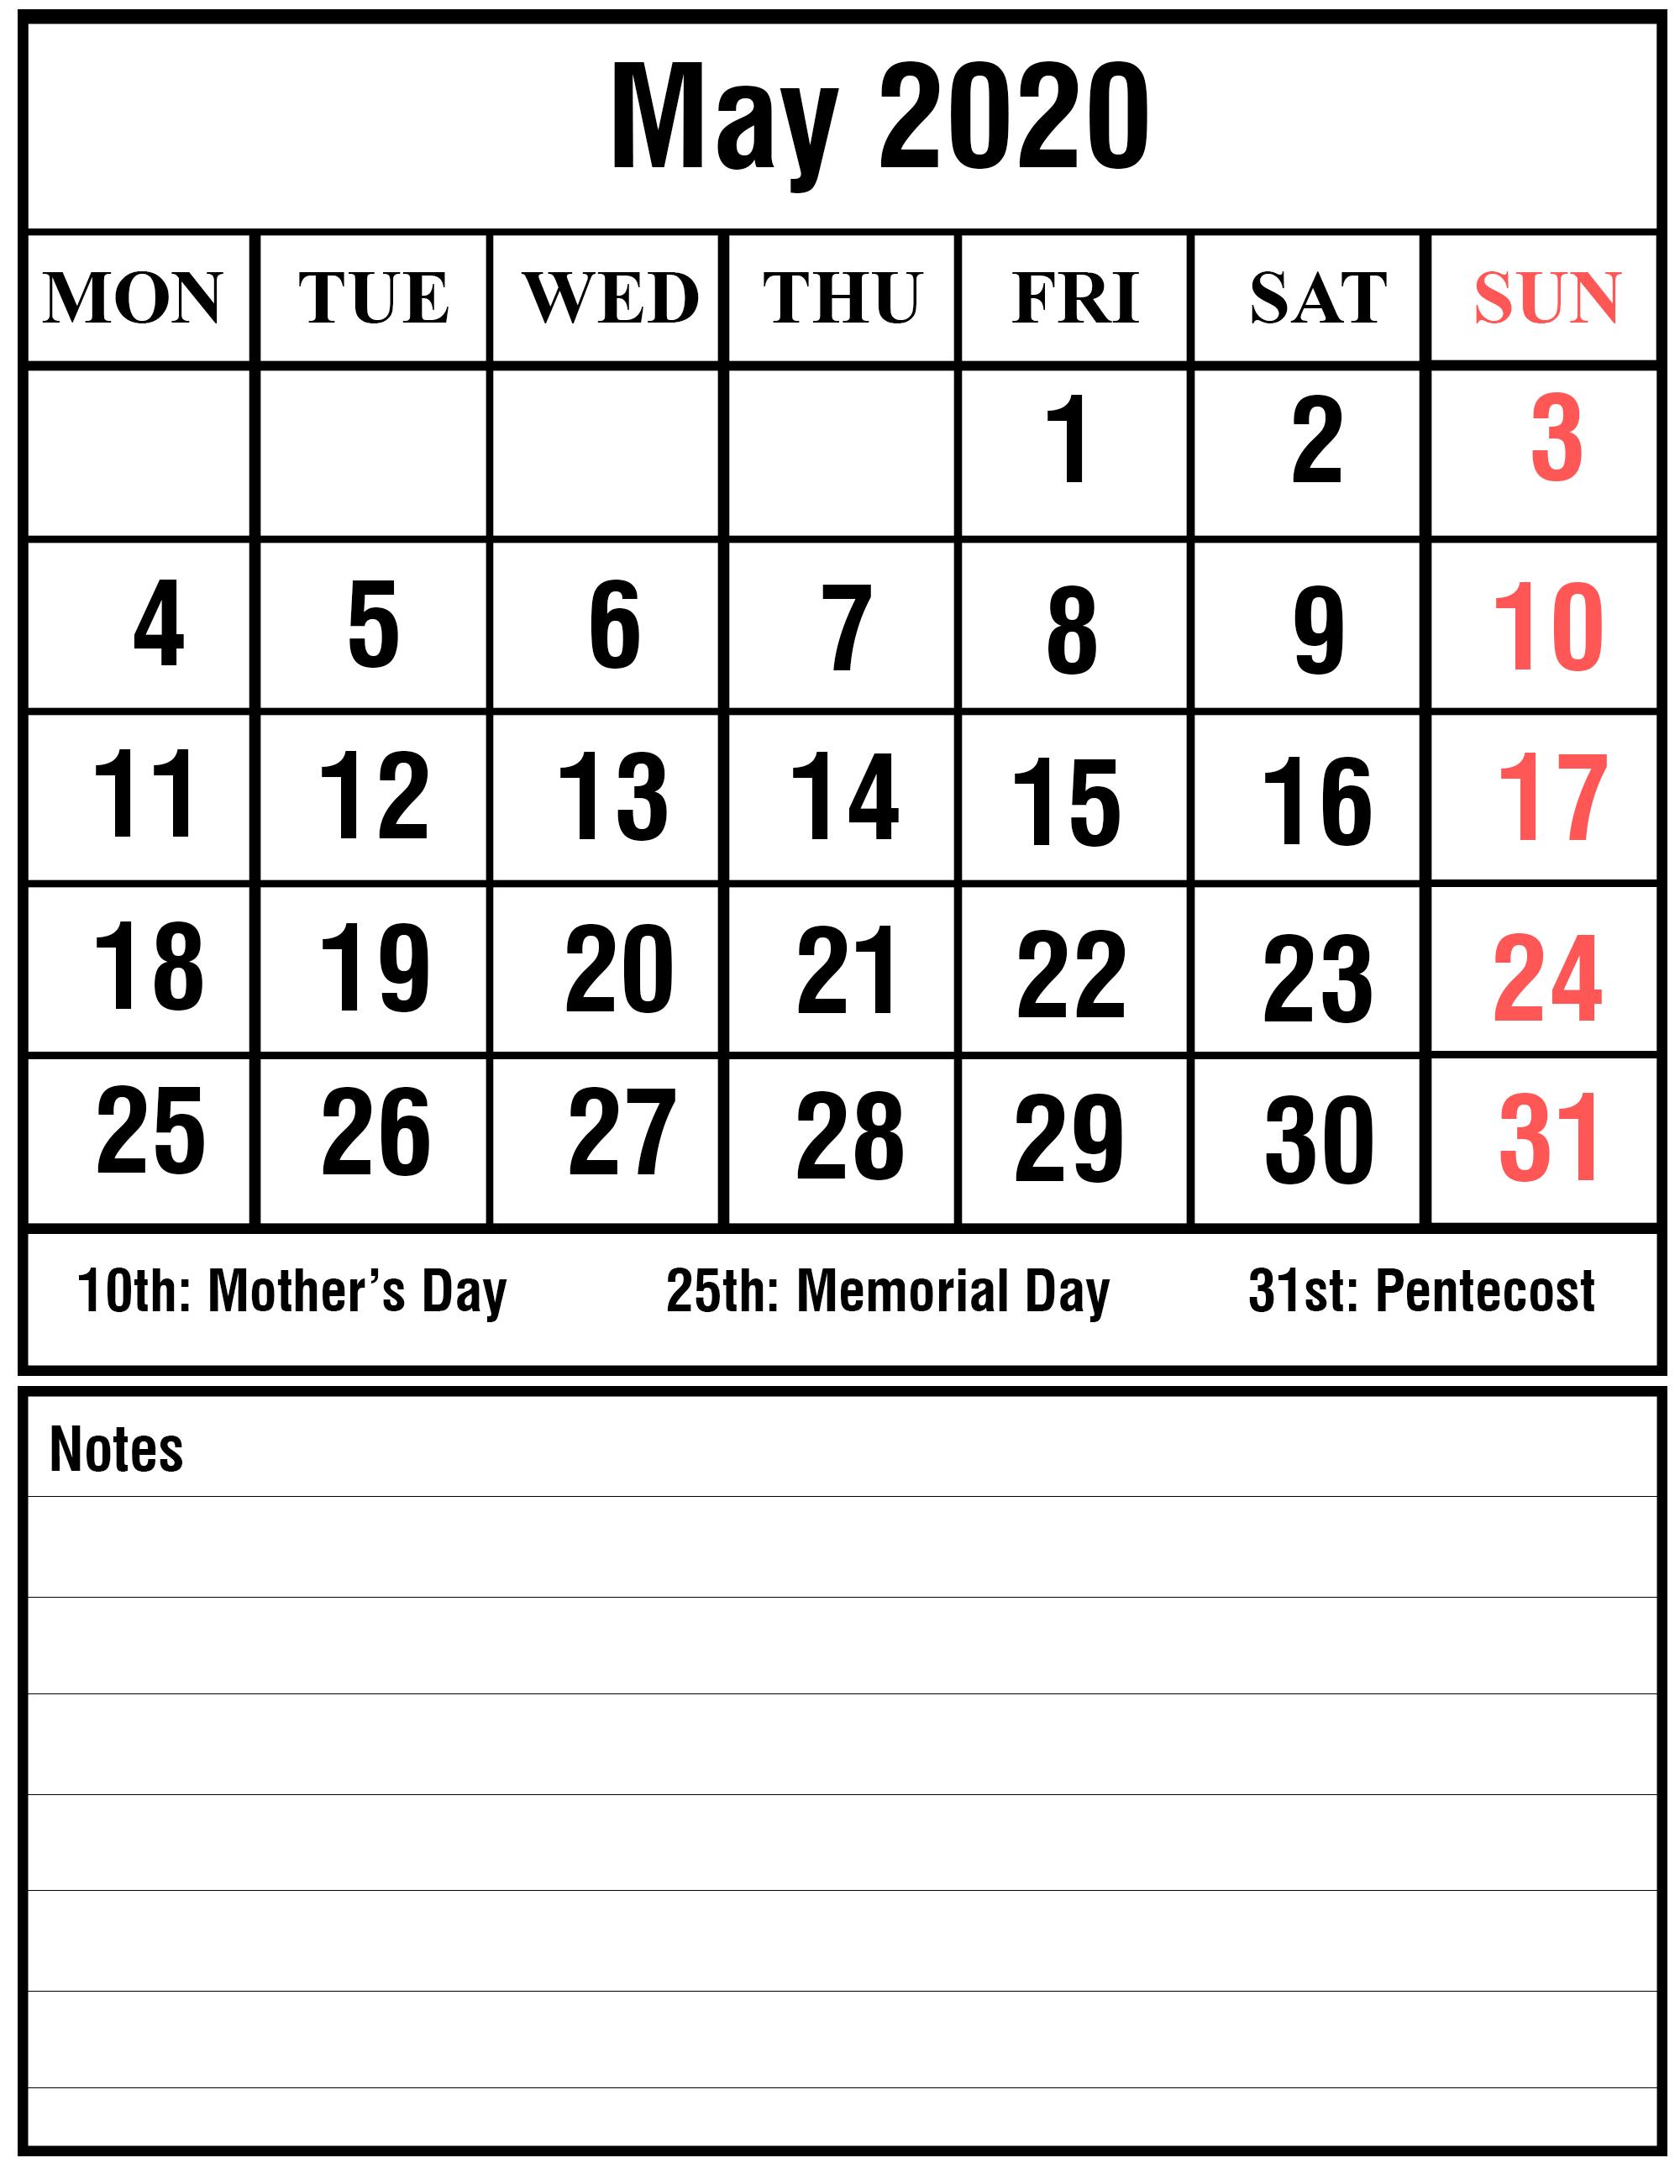 May 2020 Calendar Portrait